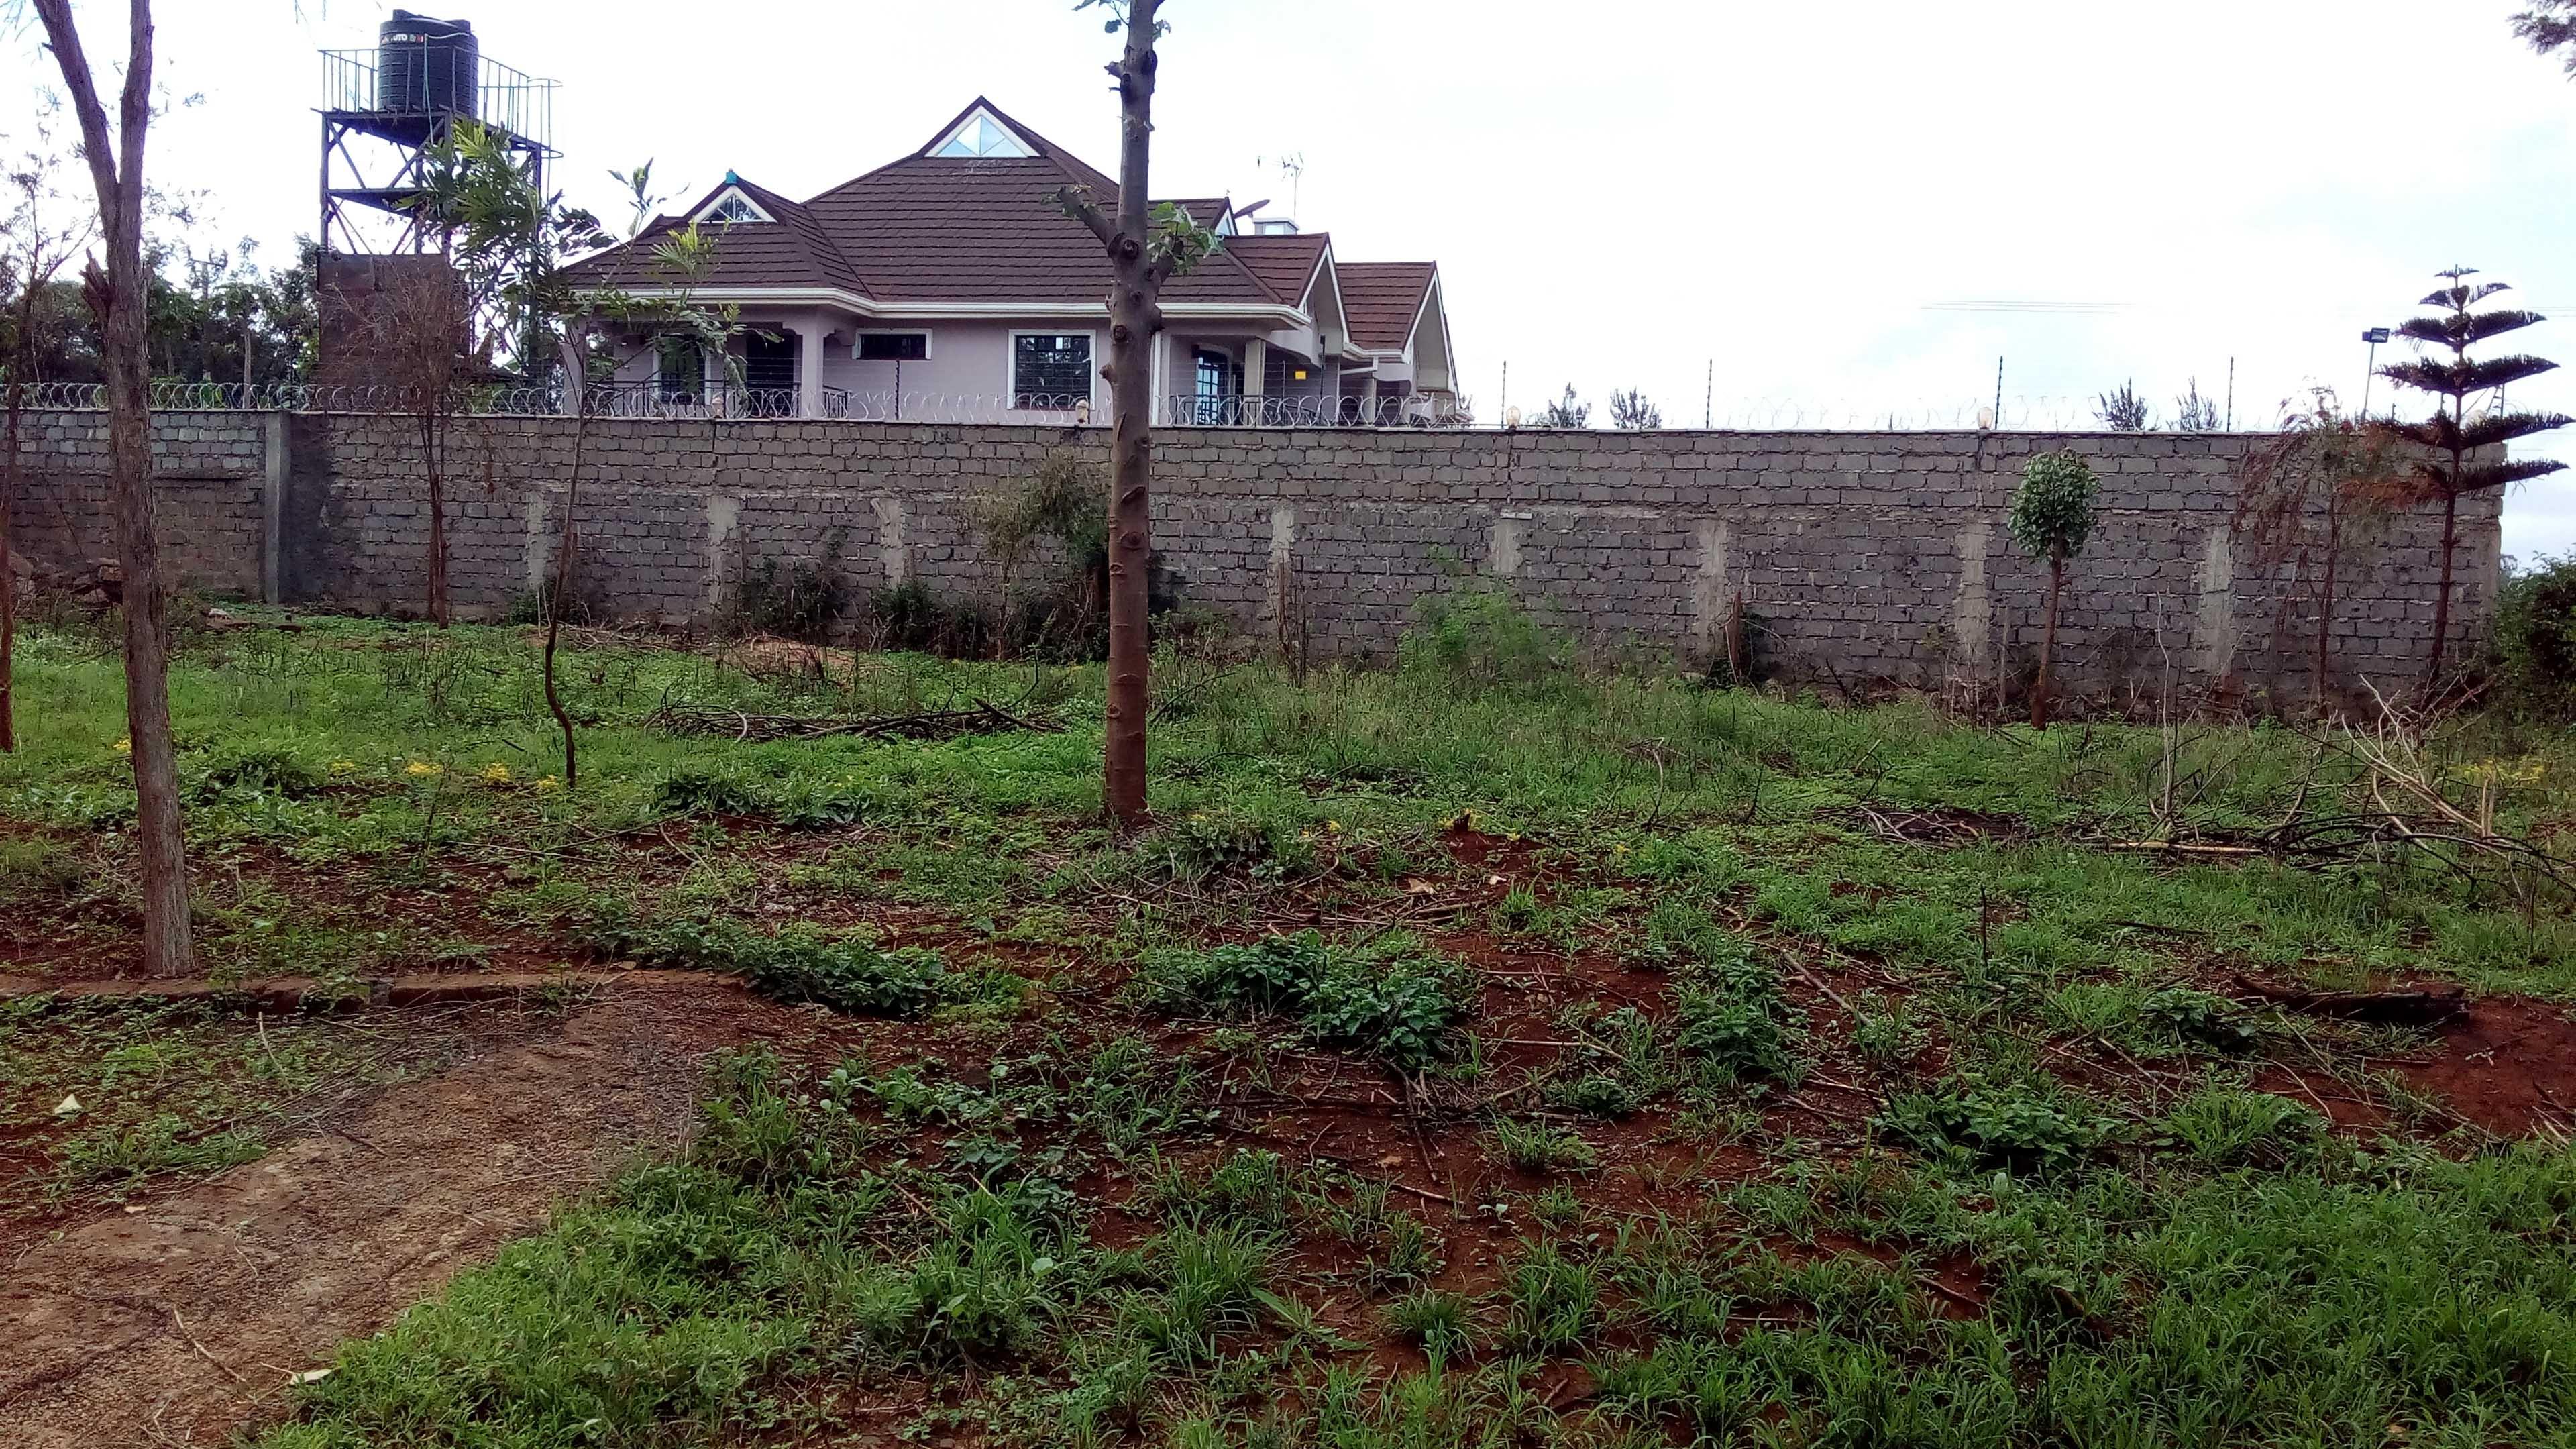 1/4 Acre Plot In Secure Controlled Development Gated Establishment.